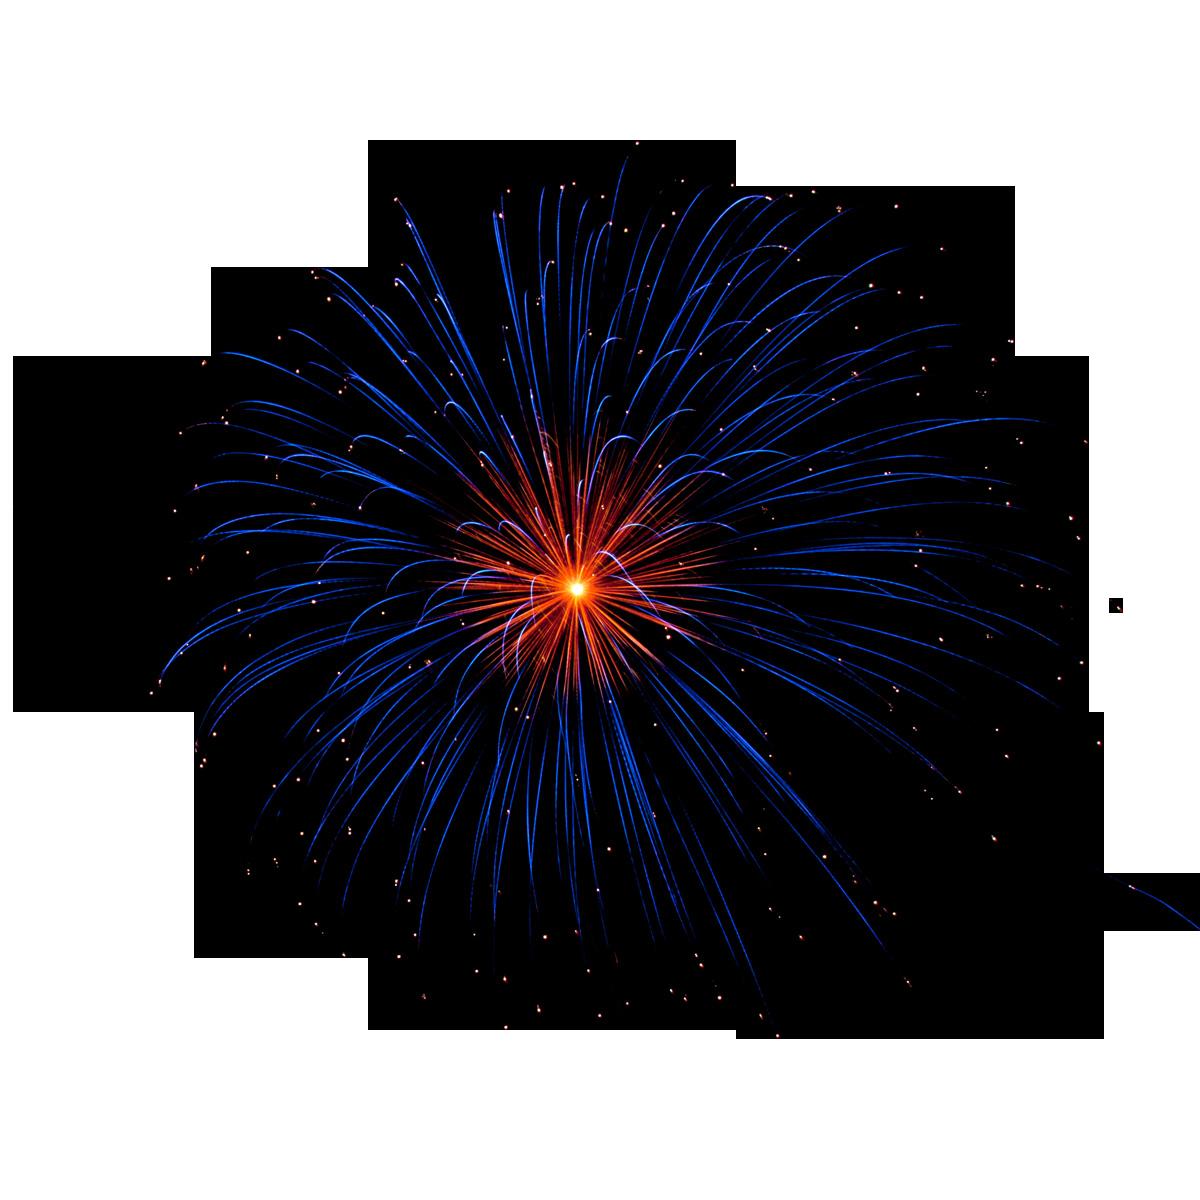 Png transparent images free. Clipart fireworks translucent